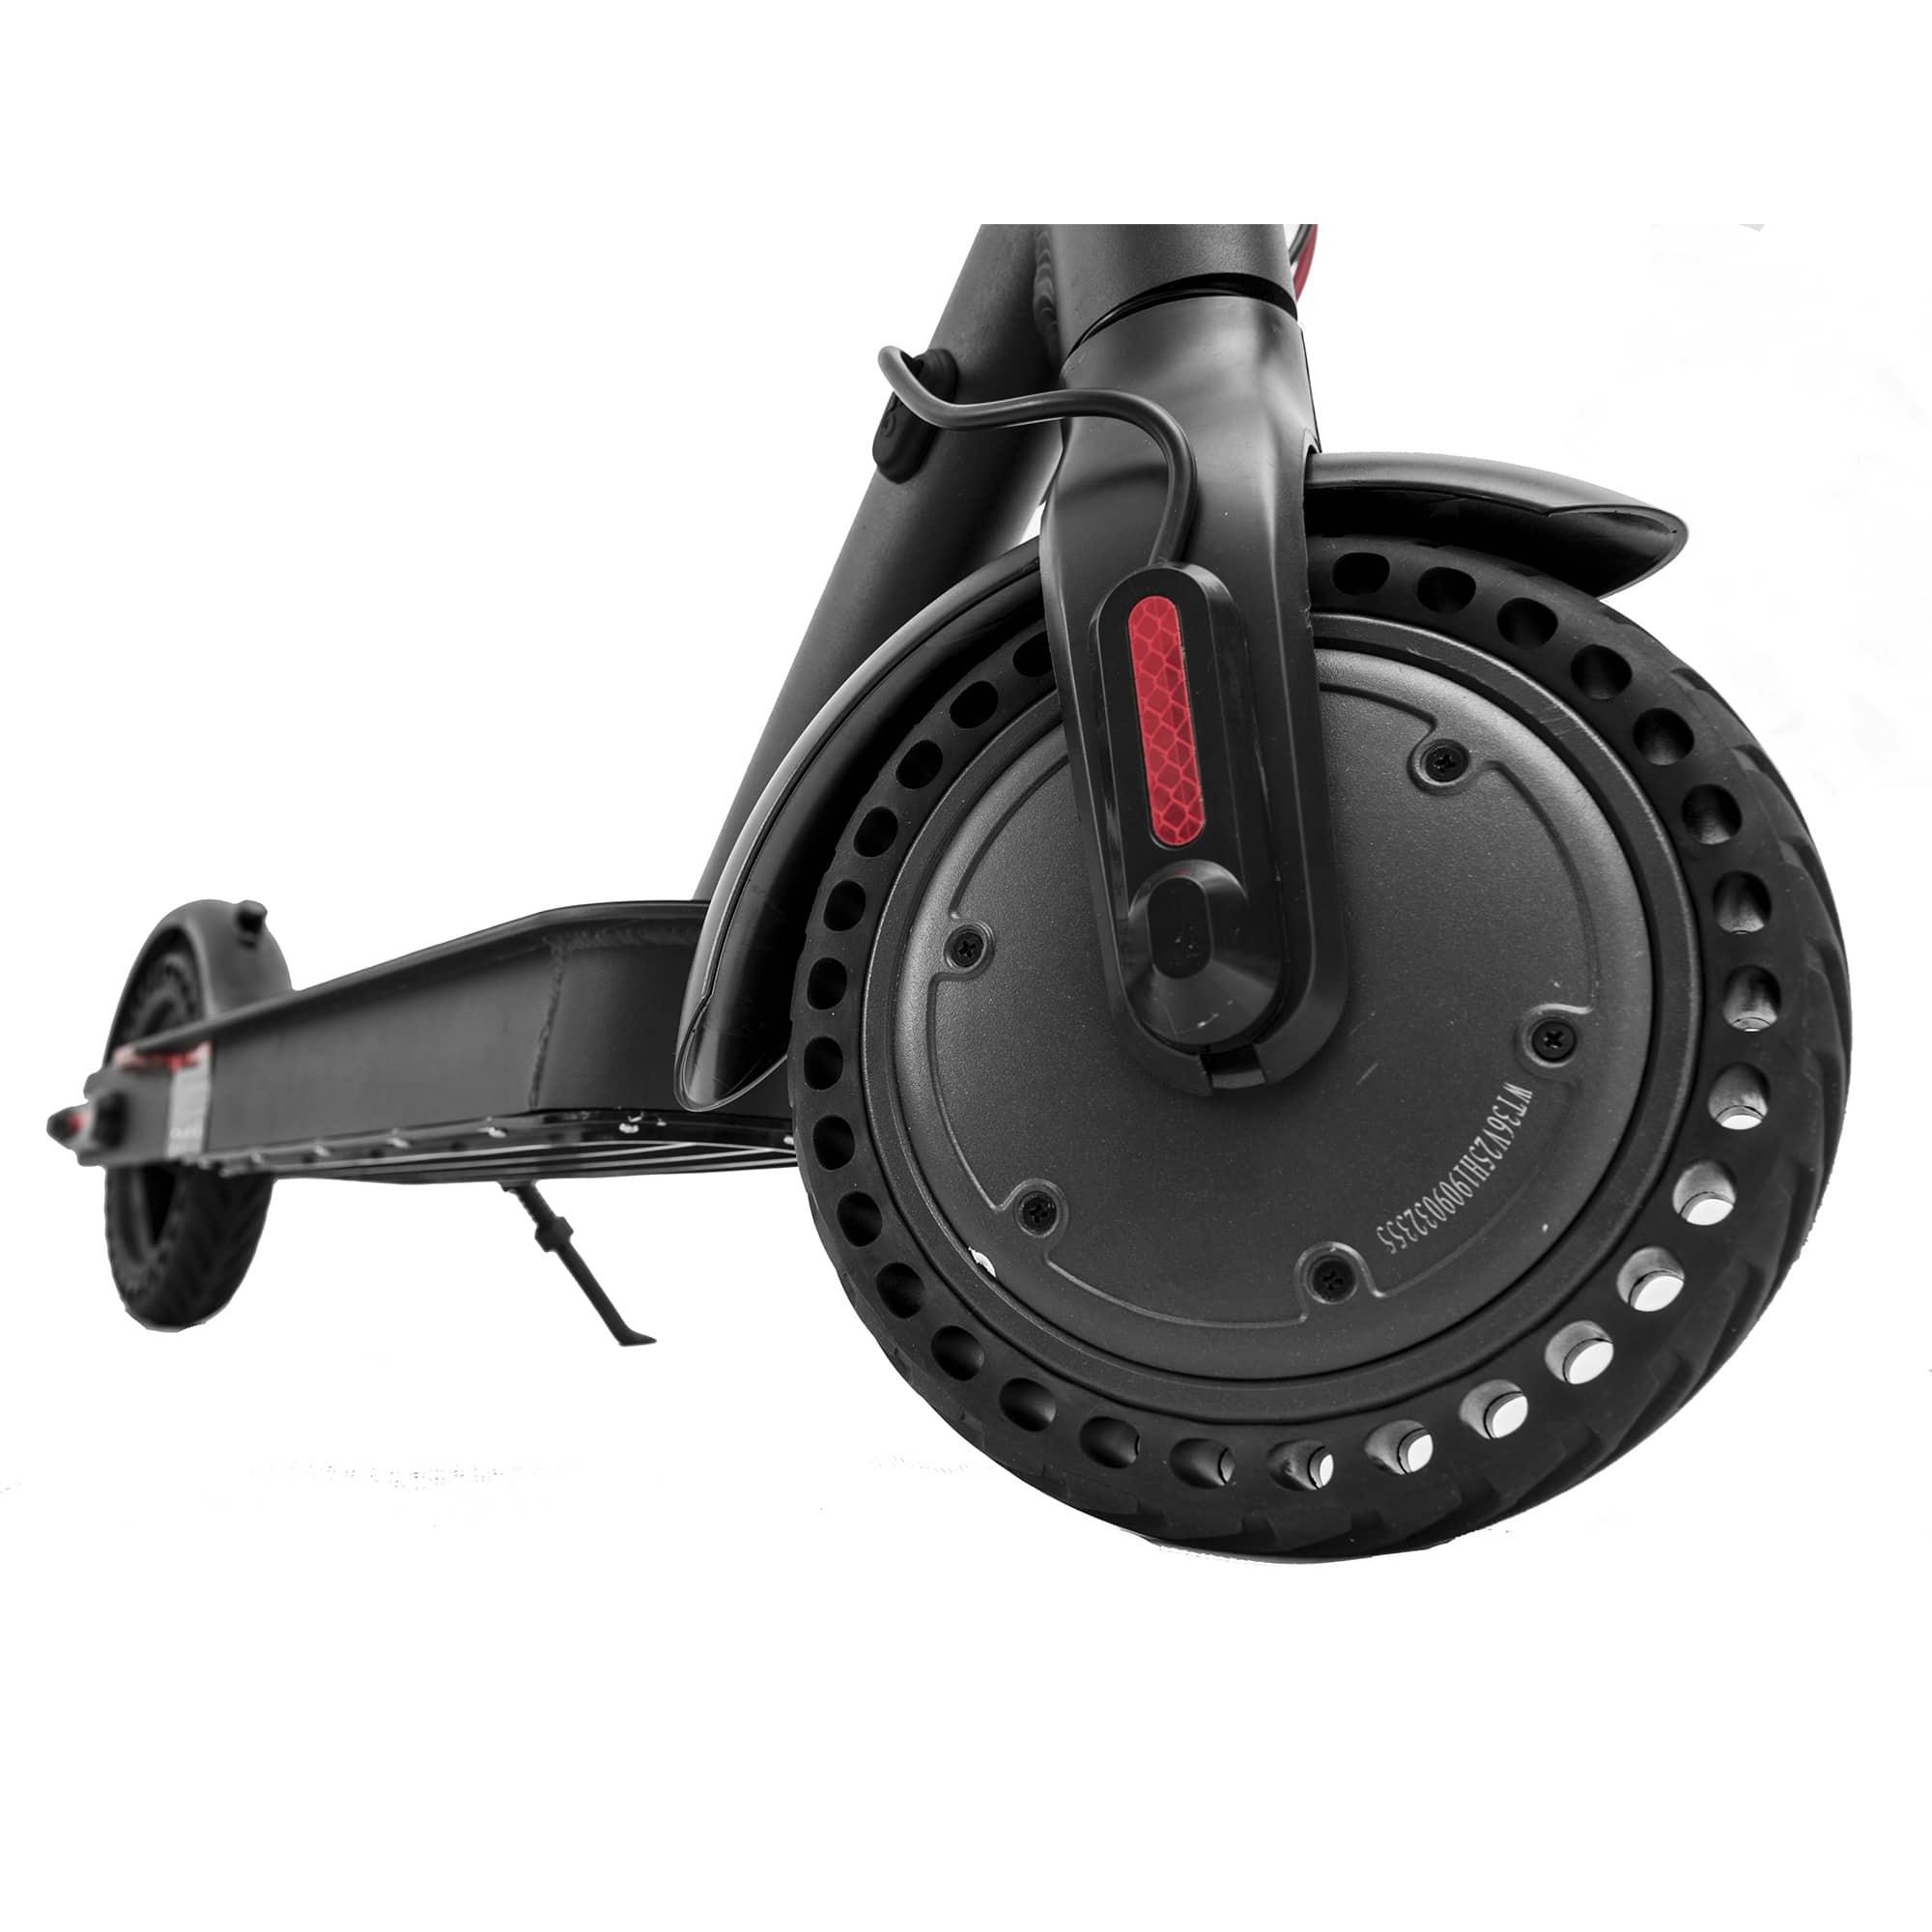 Rueda de patinete eléctrico E9 Basic - Zwheel